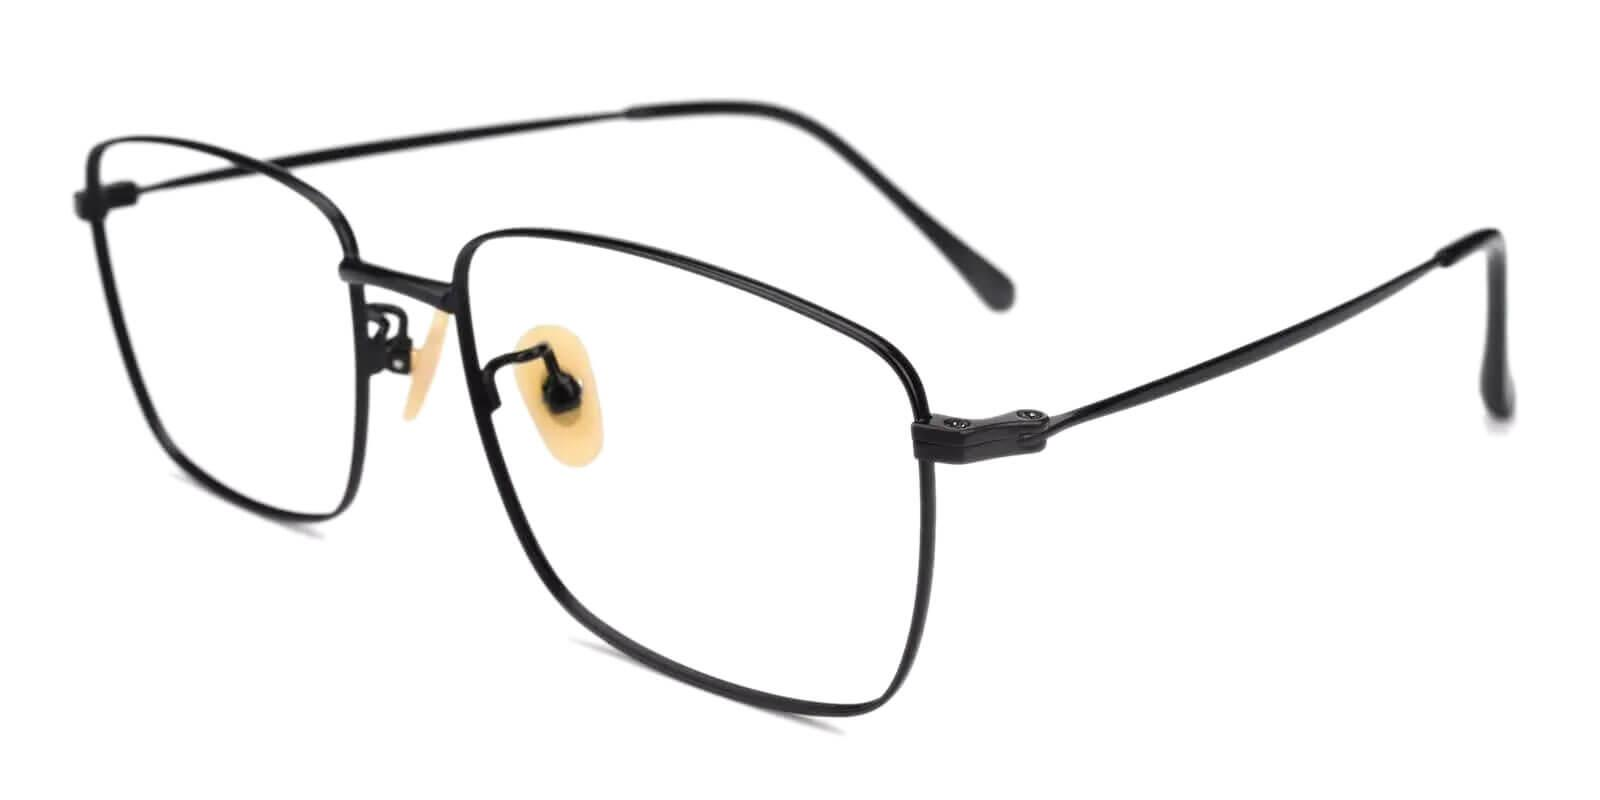 Morocco Black Titanium Eyeglasses , Lightweight , NosePads Frames from ABBE Glasses